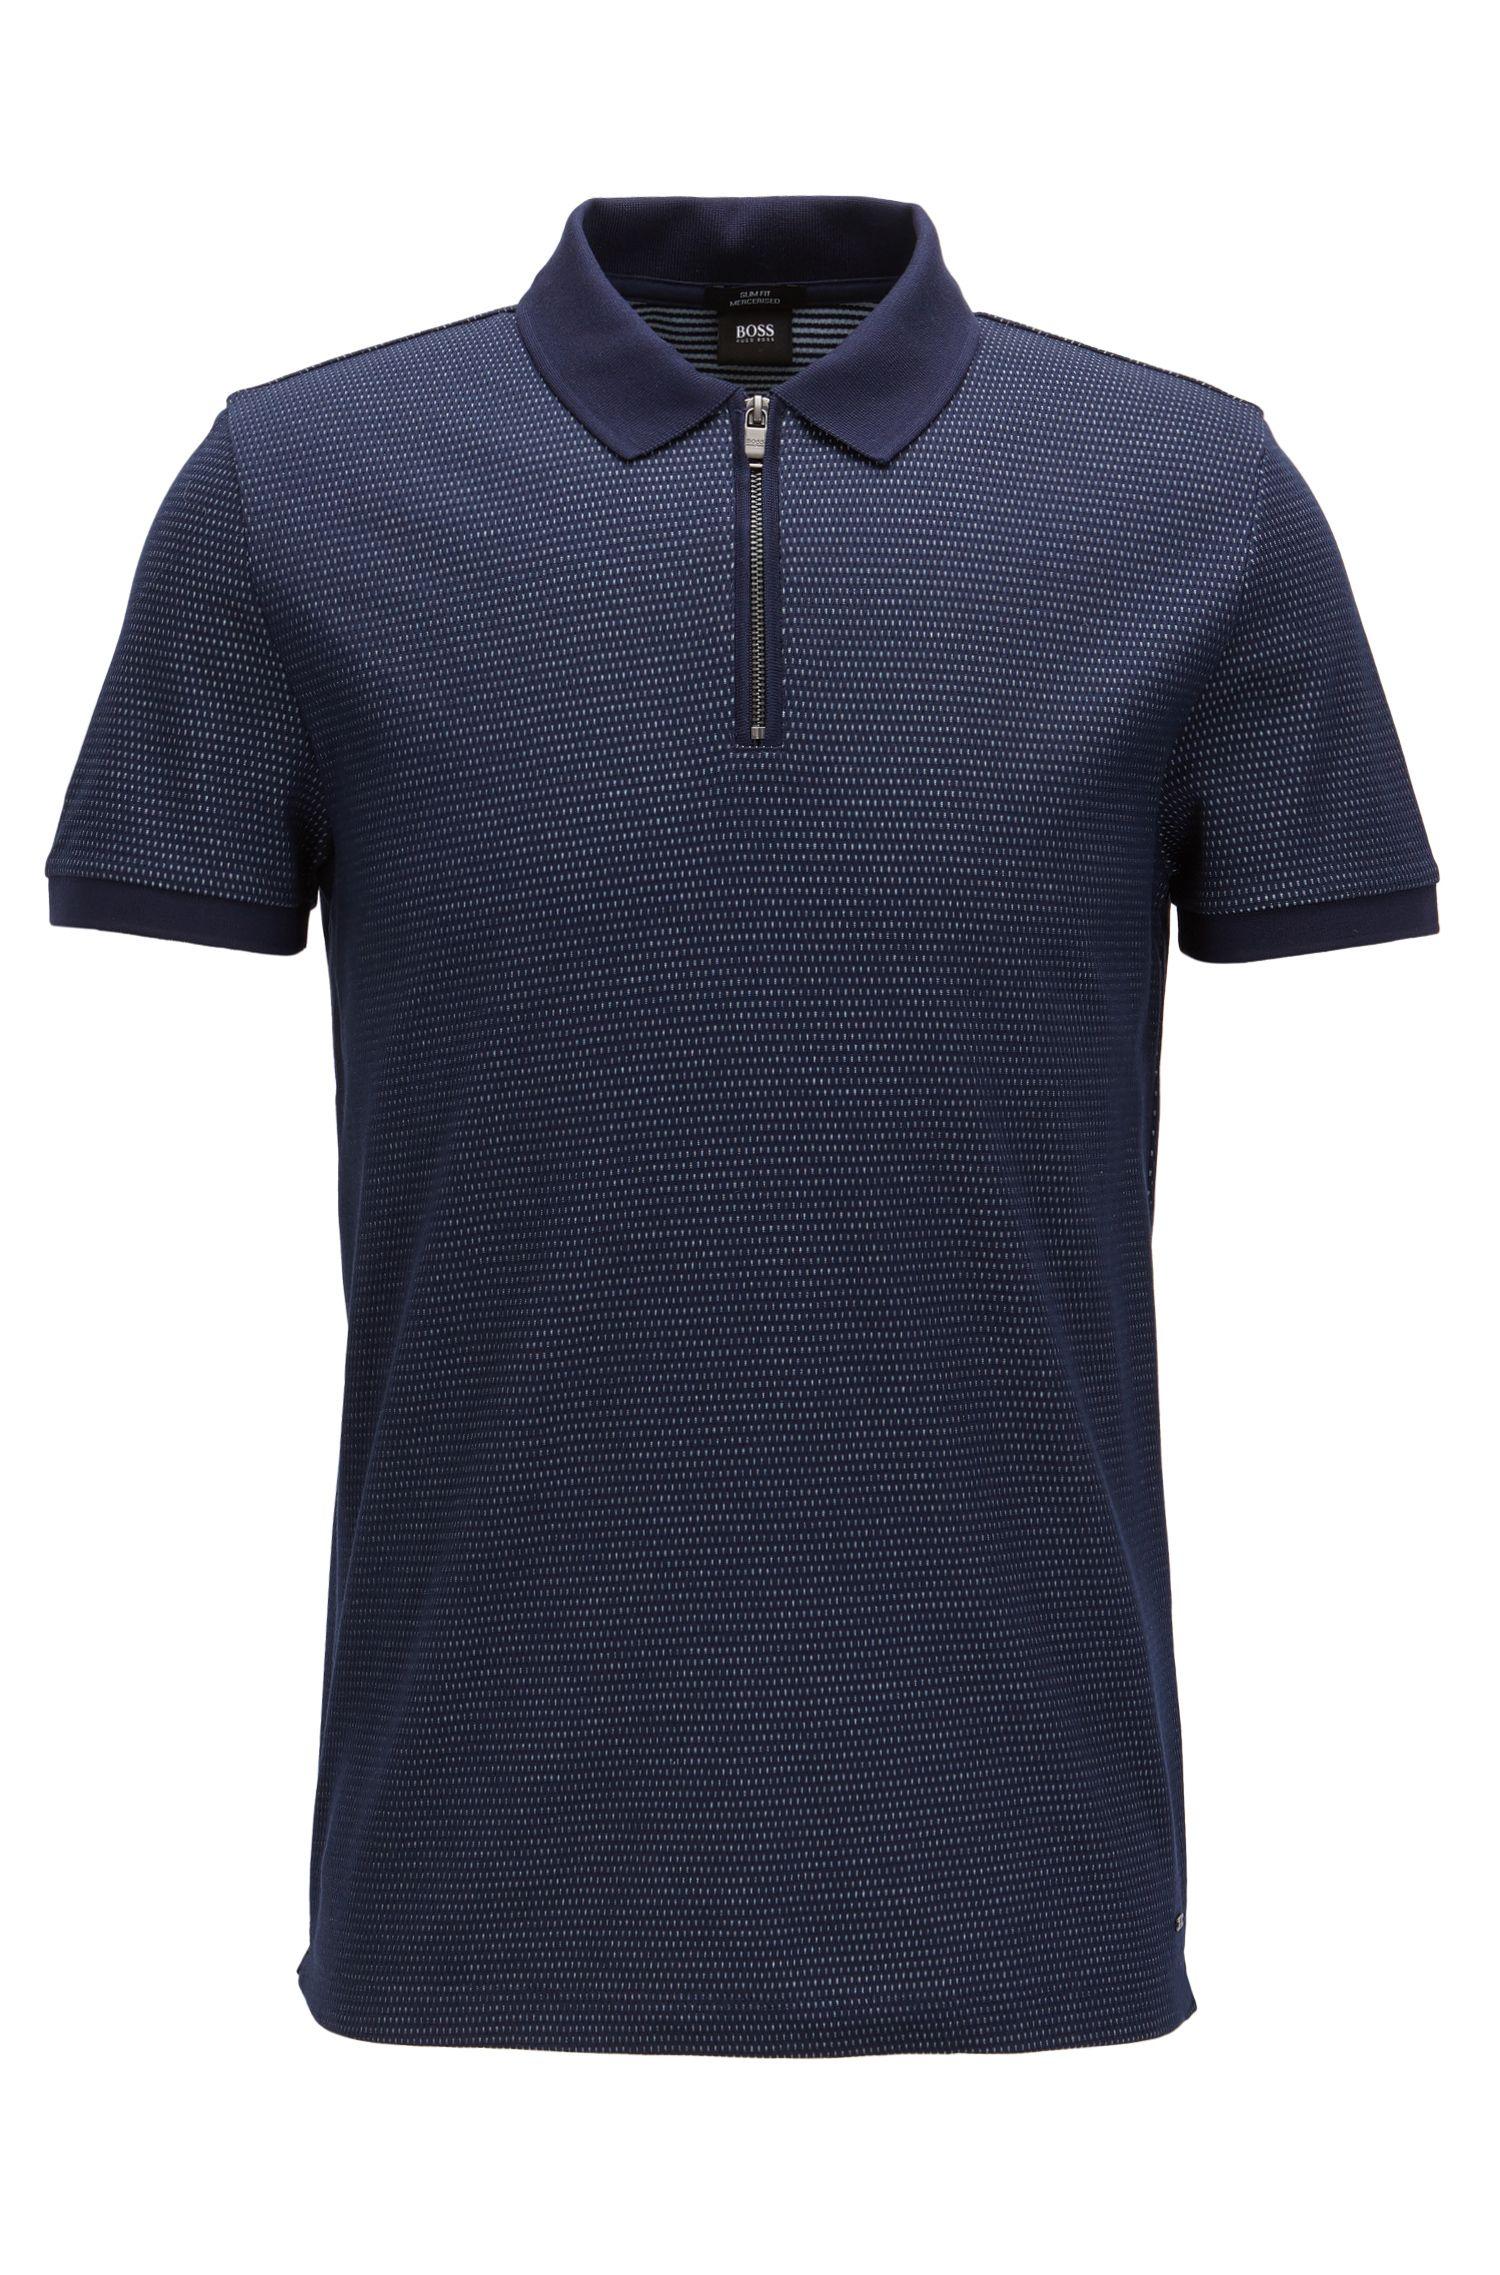 Patterned Cotton Polo Shirt, Slim Fit | Polston